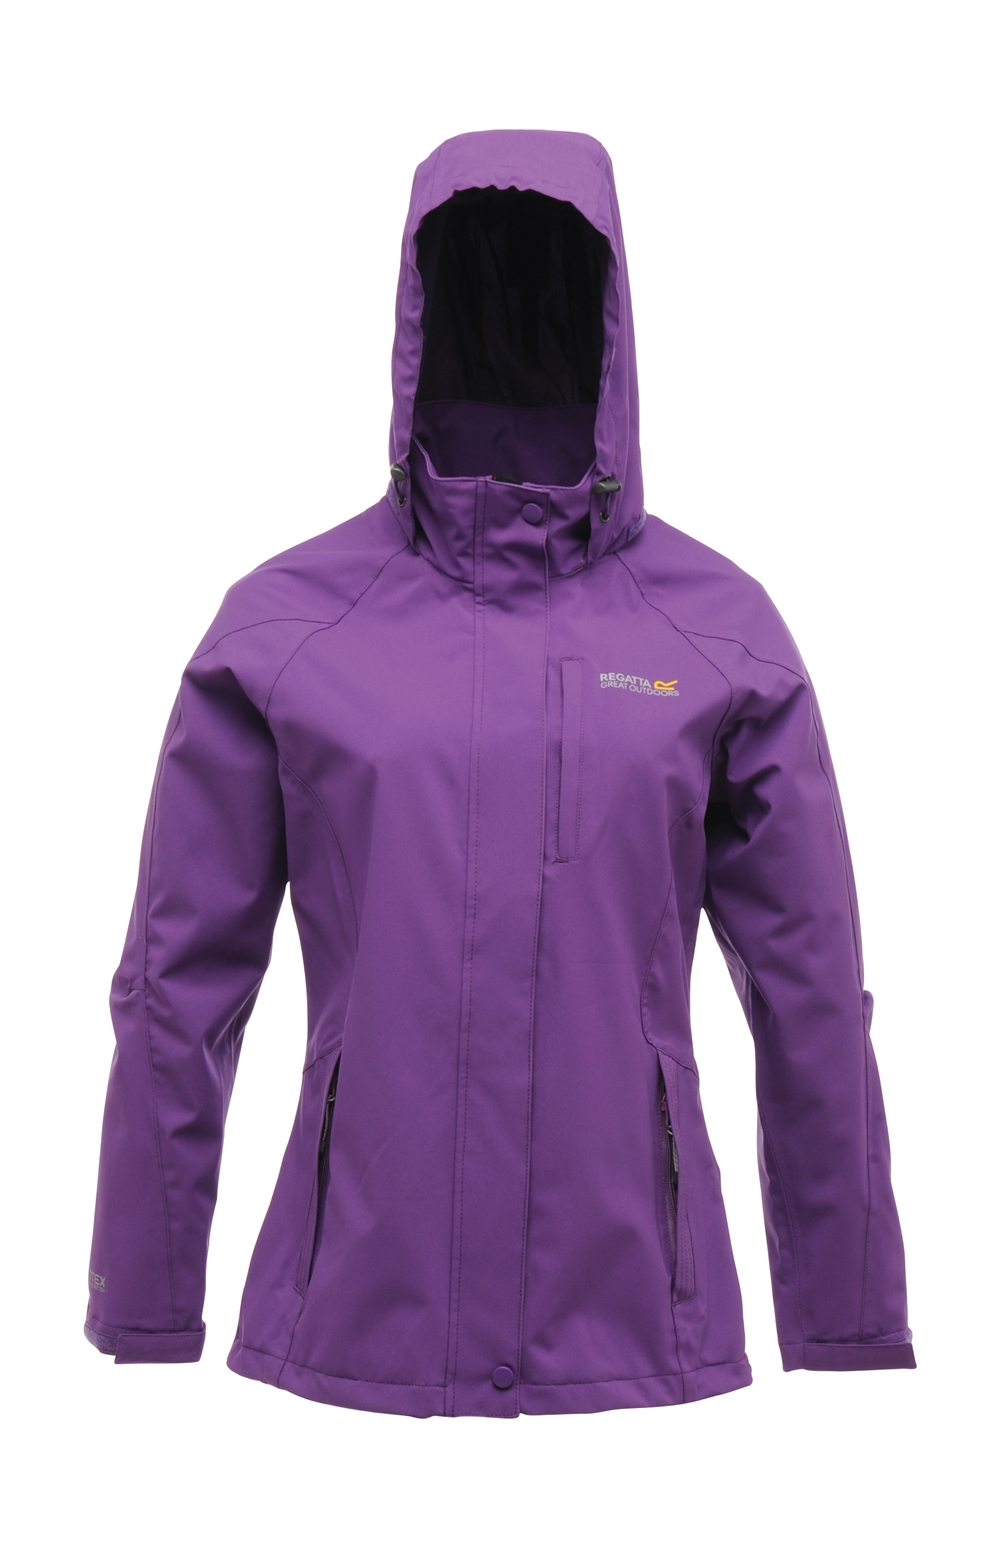 Plus size womens rain jackets